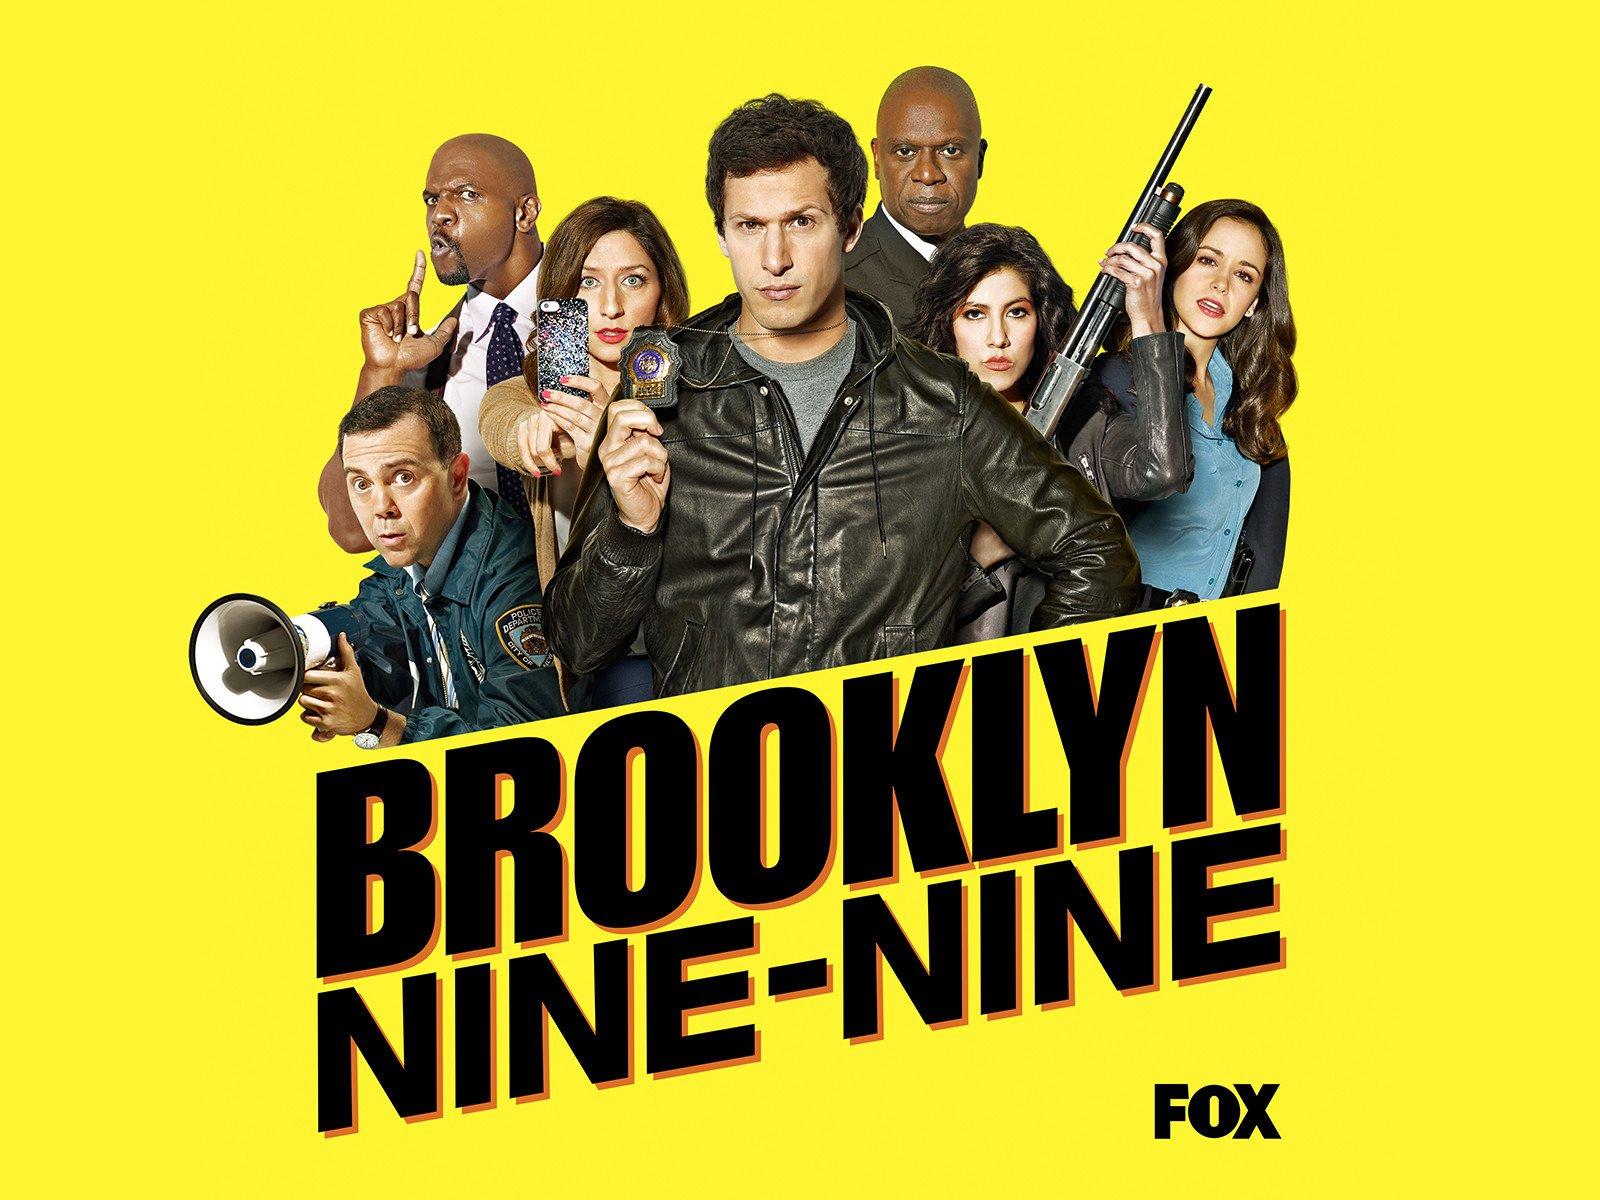 Brooklyn Nine Nine Wallpaper 13   1600 X 1200 stmednet 1600x1200